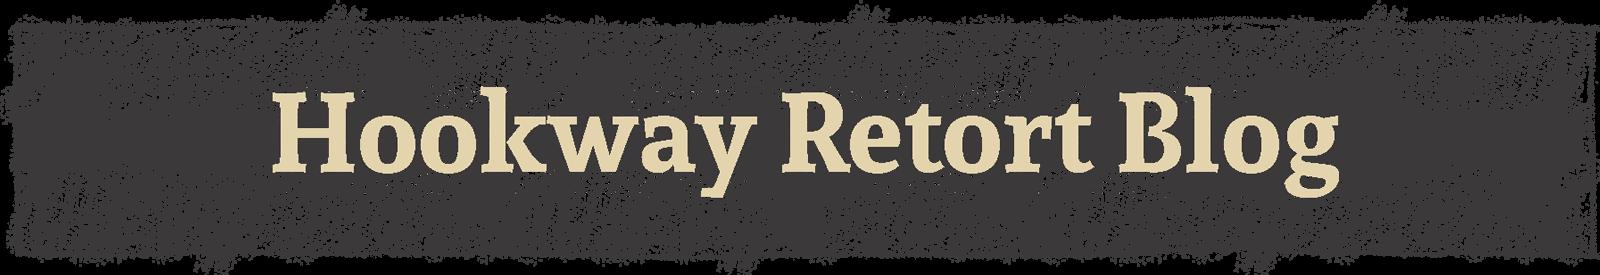 hookway-title-retort